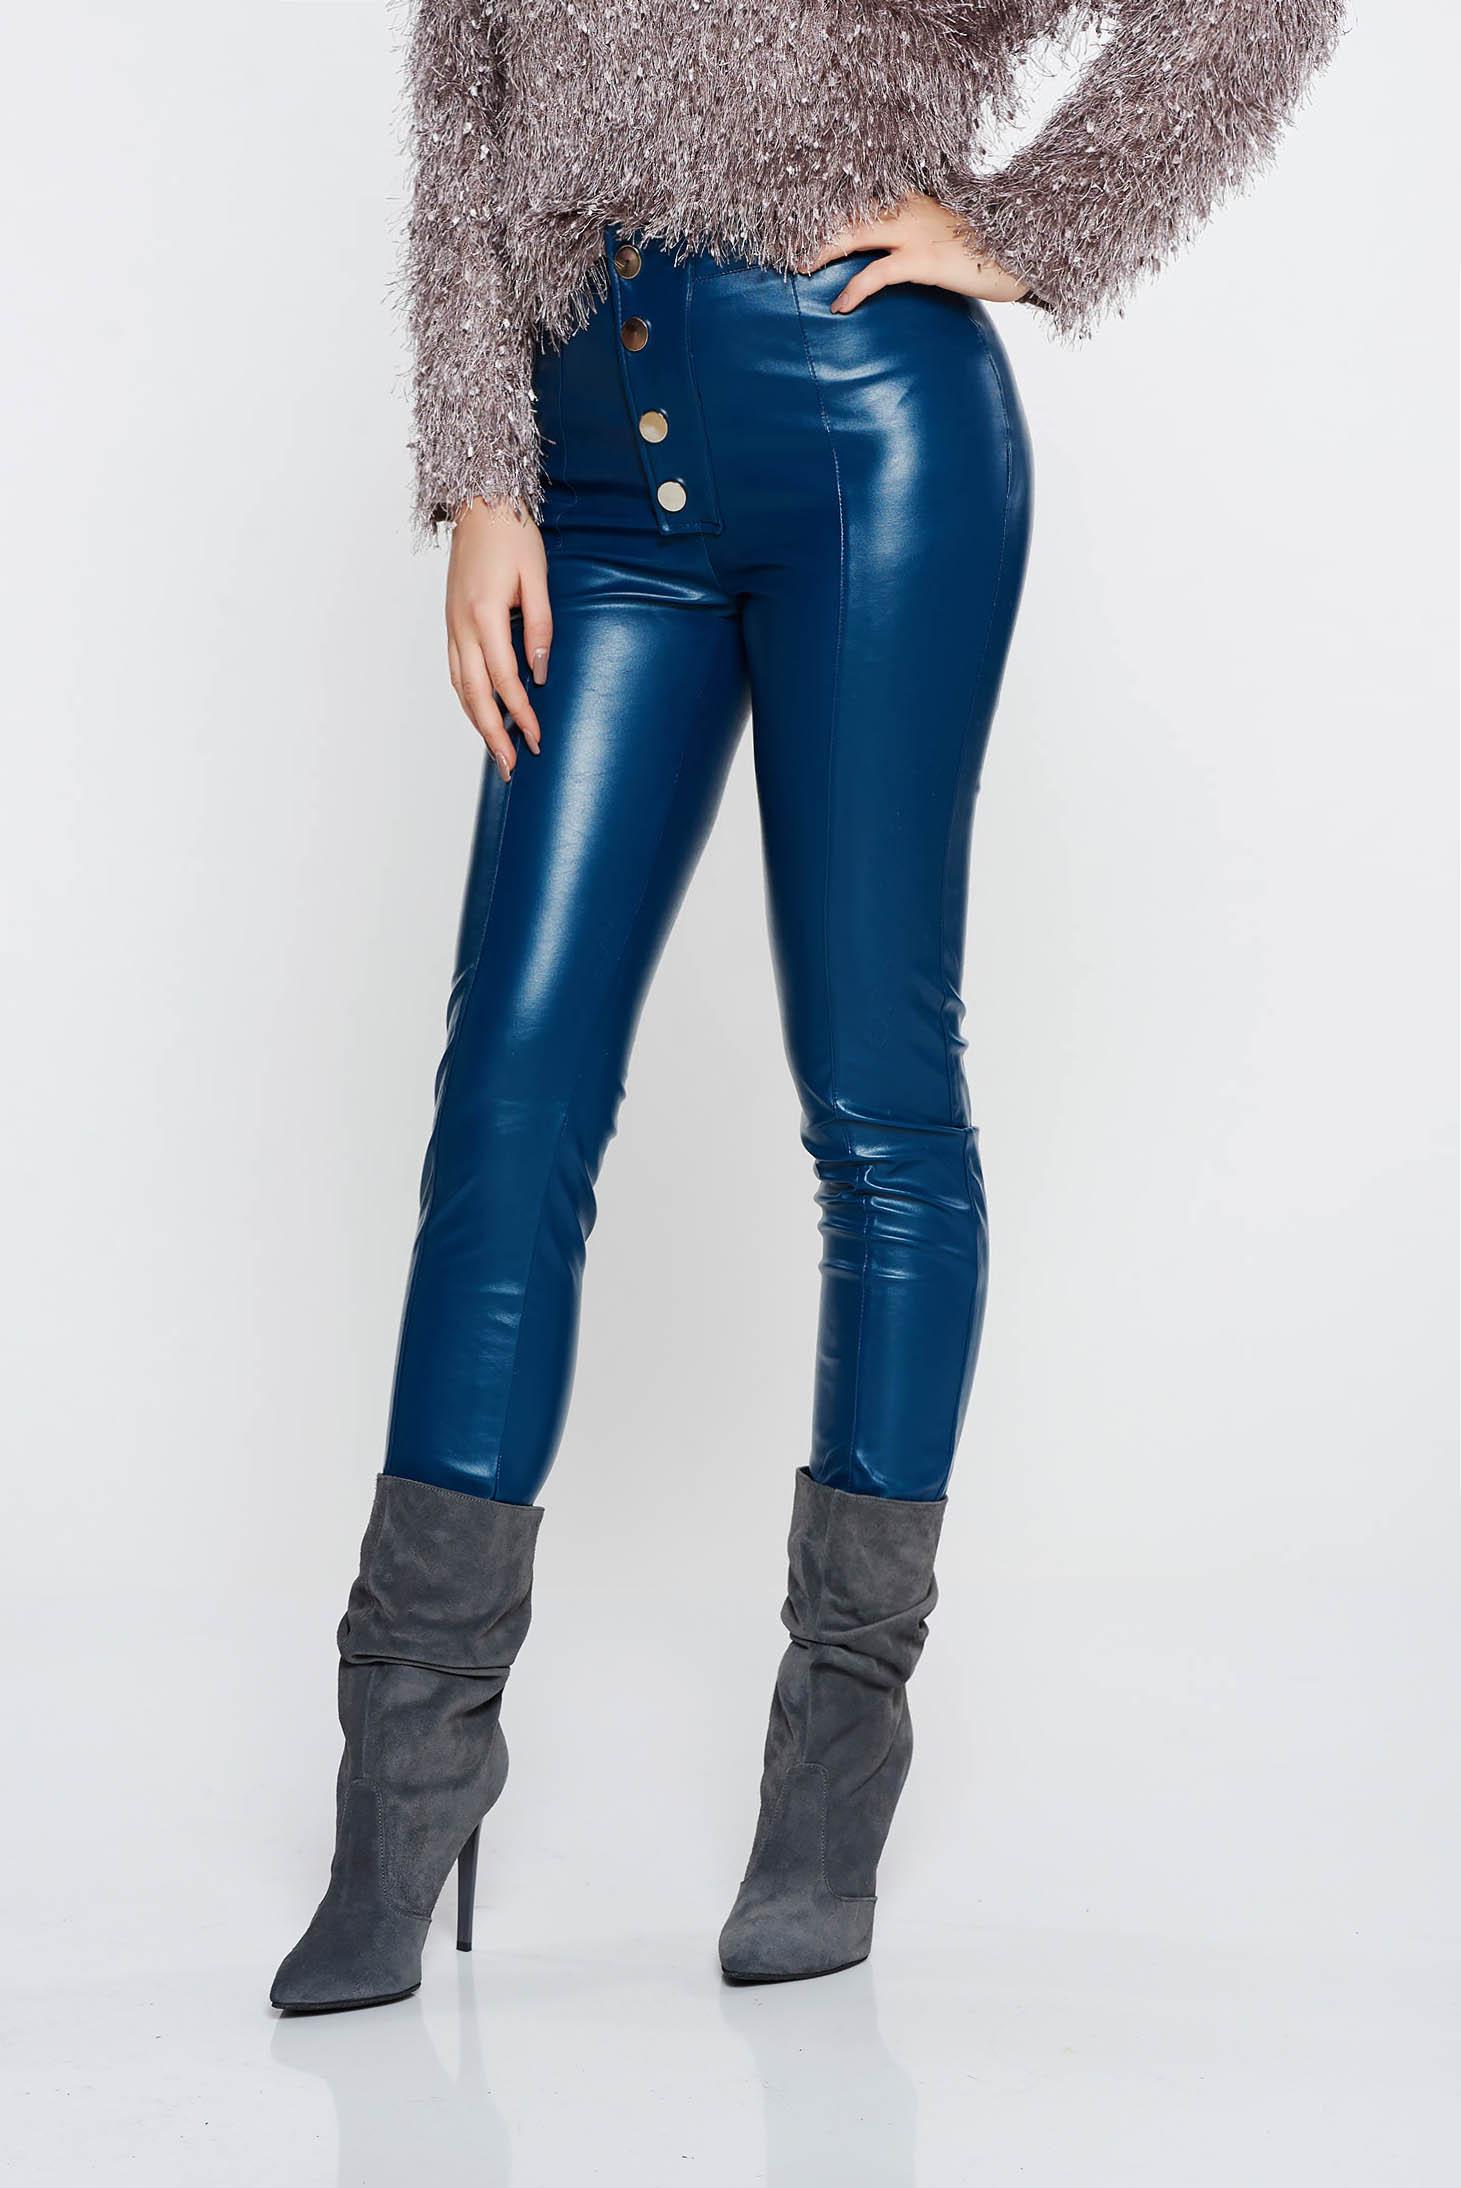 Pantaloni PrettyGirl albastri casual conici cu talie inalta din piele ecologica